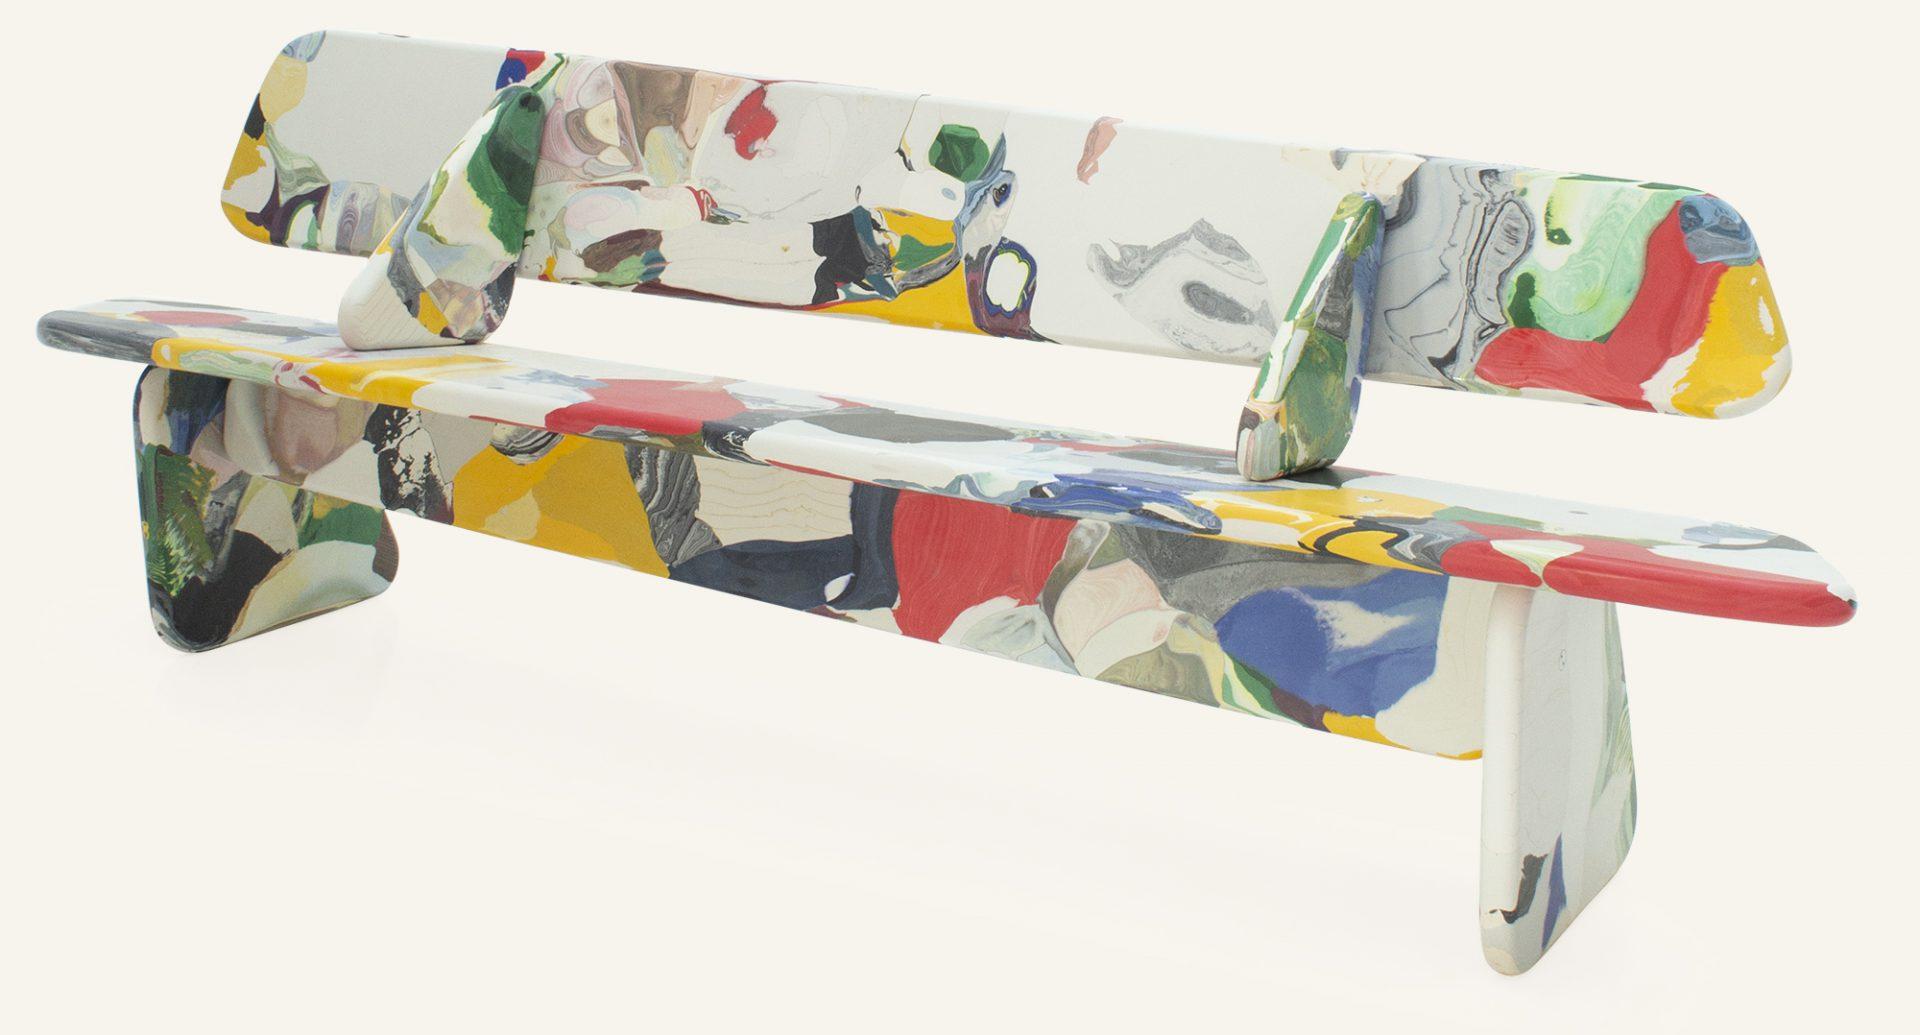 Kooij Menhir Bench Multicolour 240cm